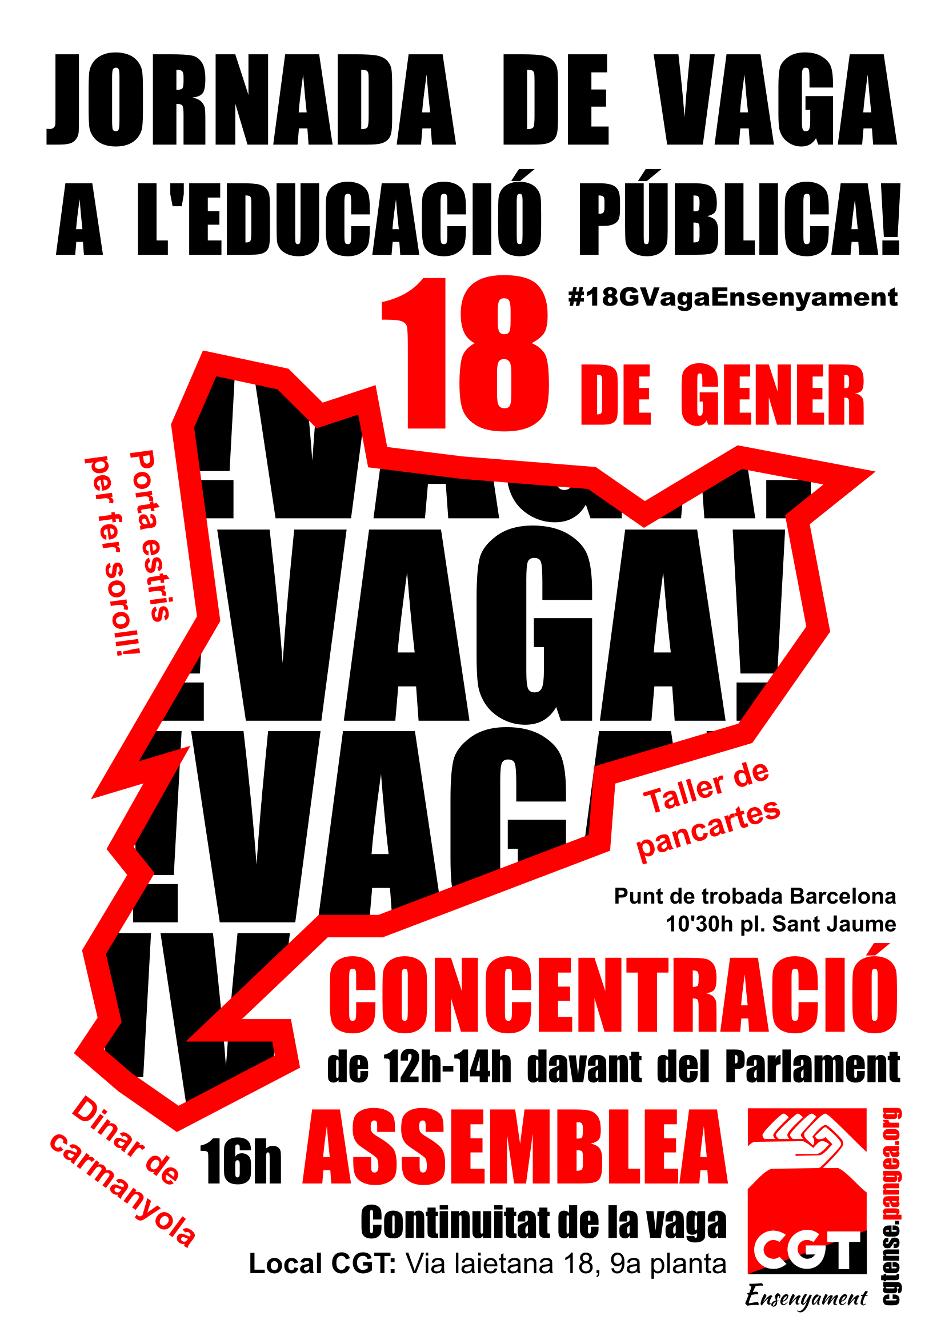 jornada_vaga18g.png